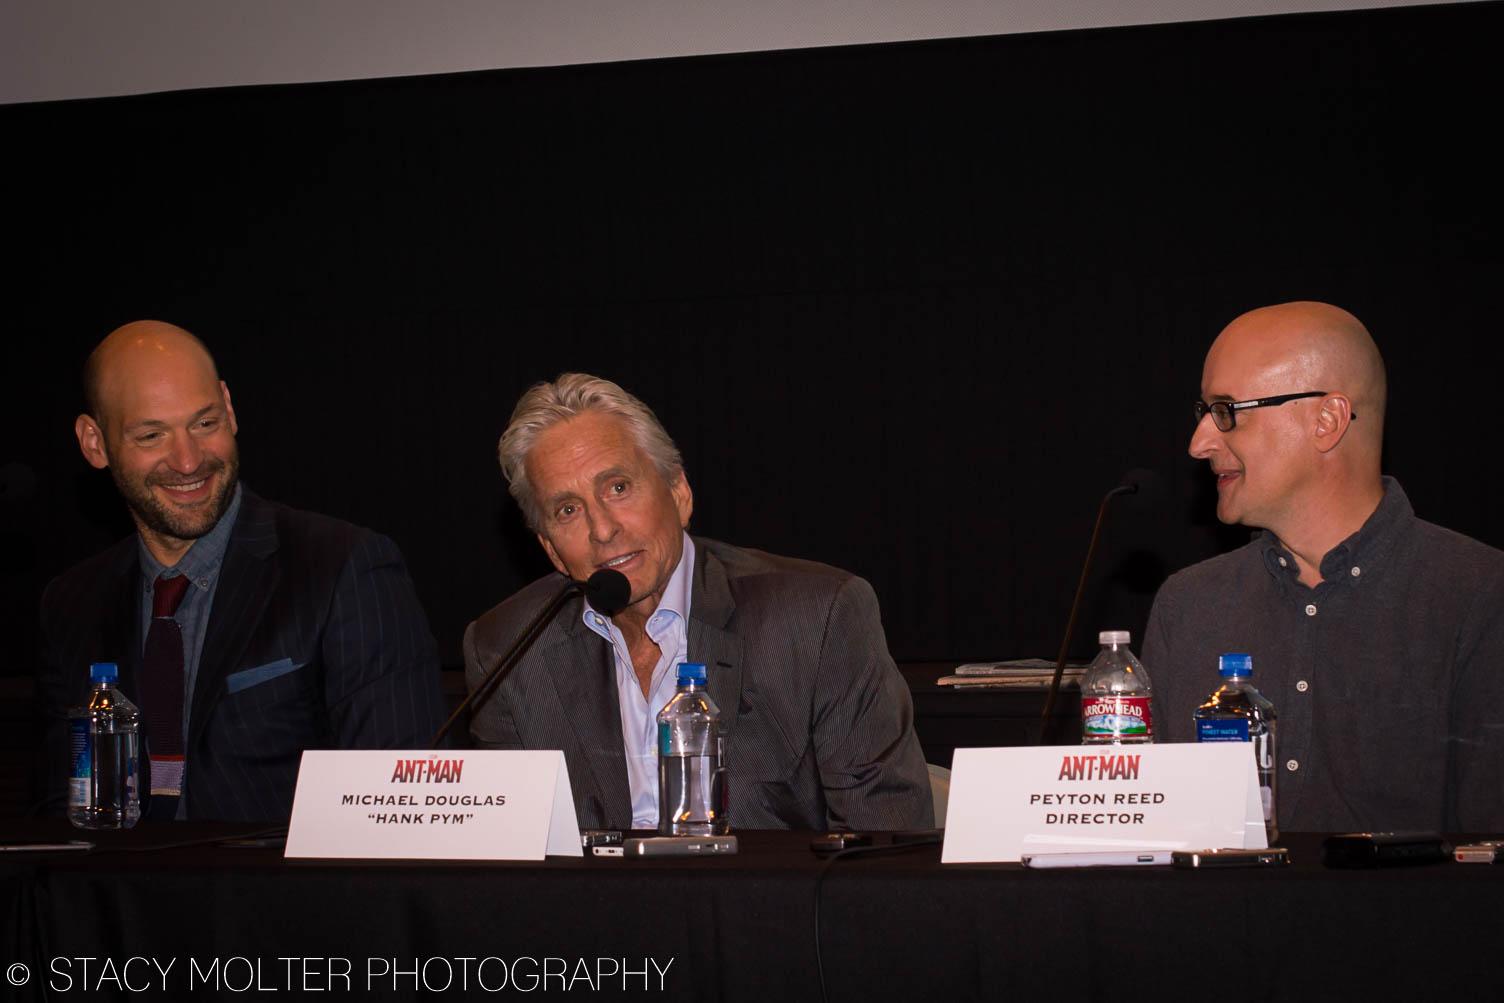 Corey Stoll, Michael Douglas, Peyton Reed - Ant-Man Press Conference